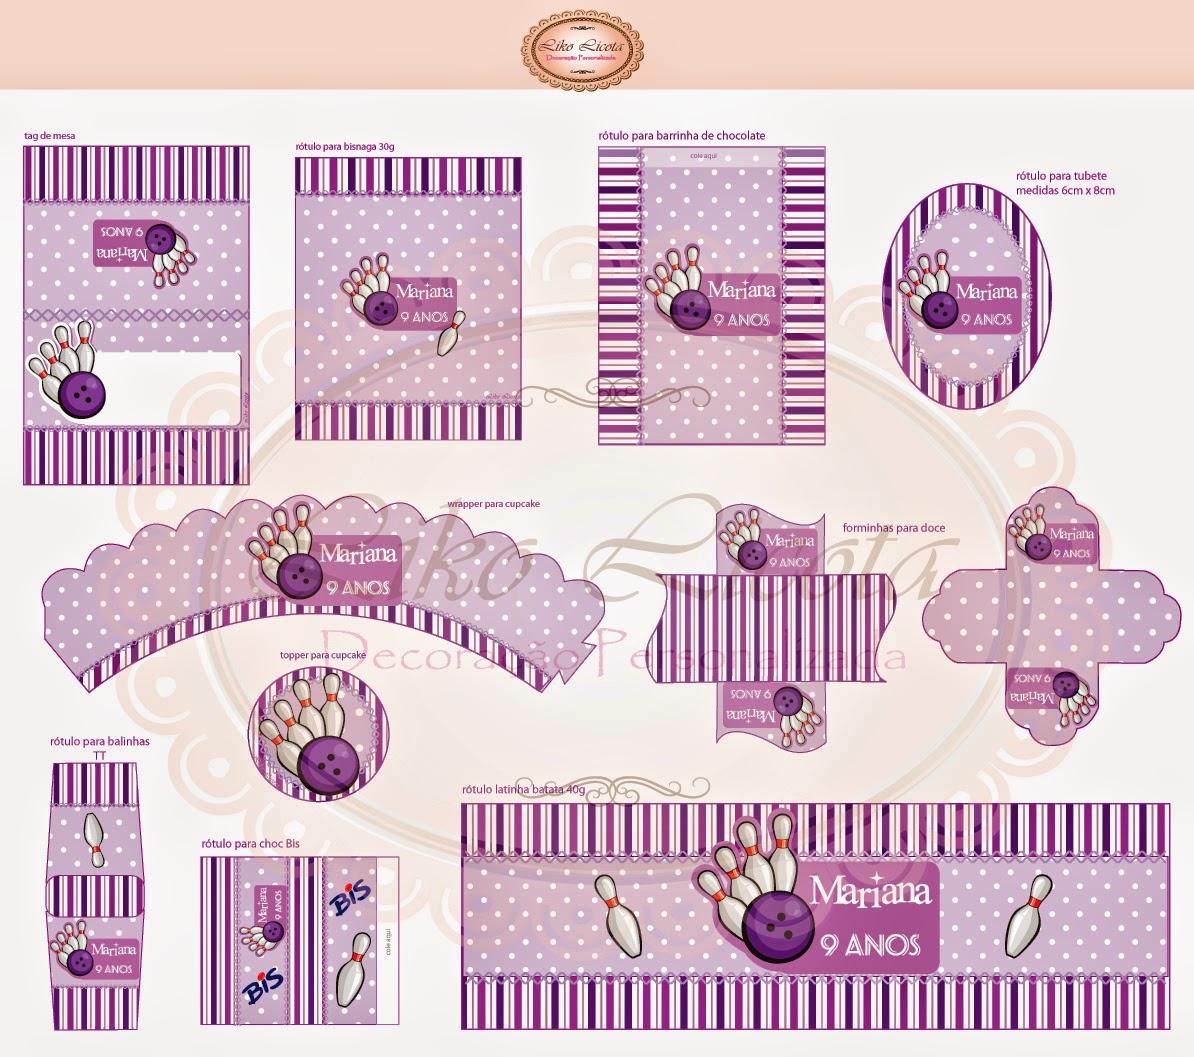 adesivos e tag tema boliche lilás personalizado